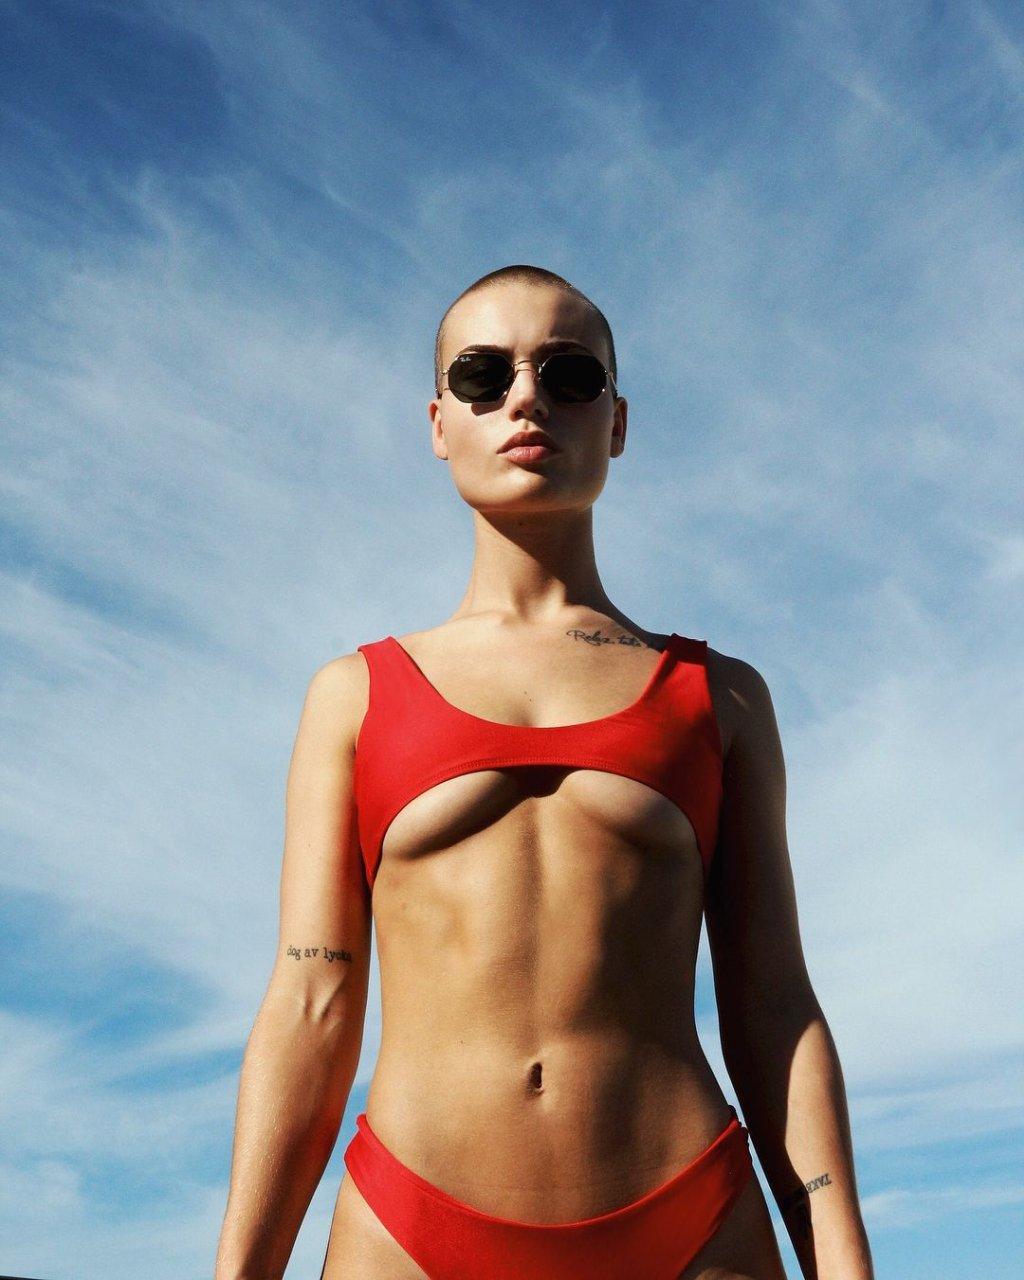 Porno Vendelali nude (52 photos), Pussy, Leaked, Instagram, swimsuit 2019